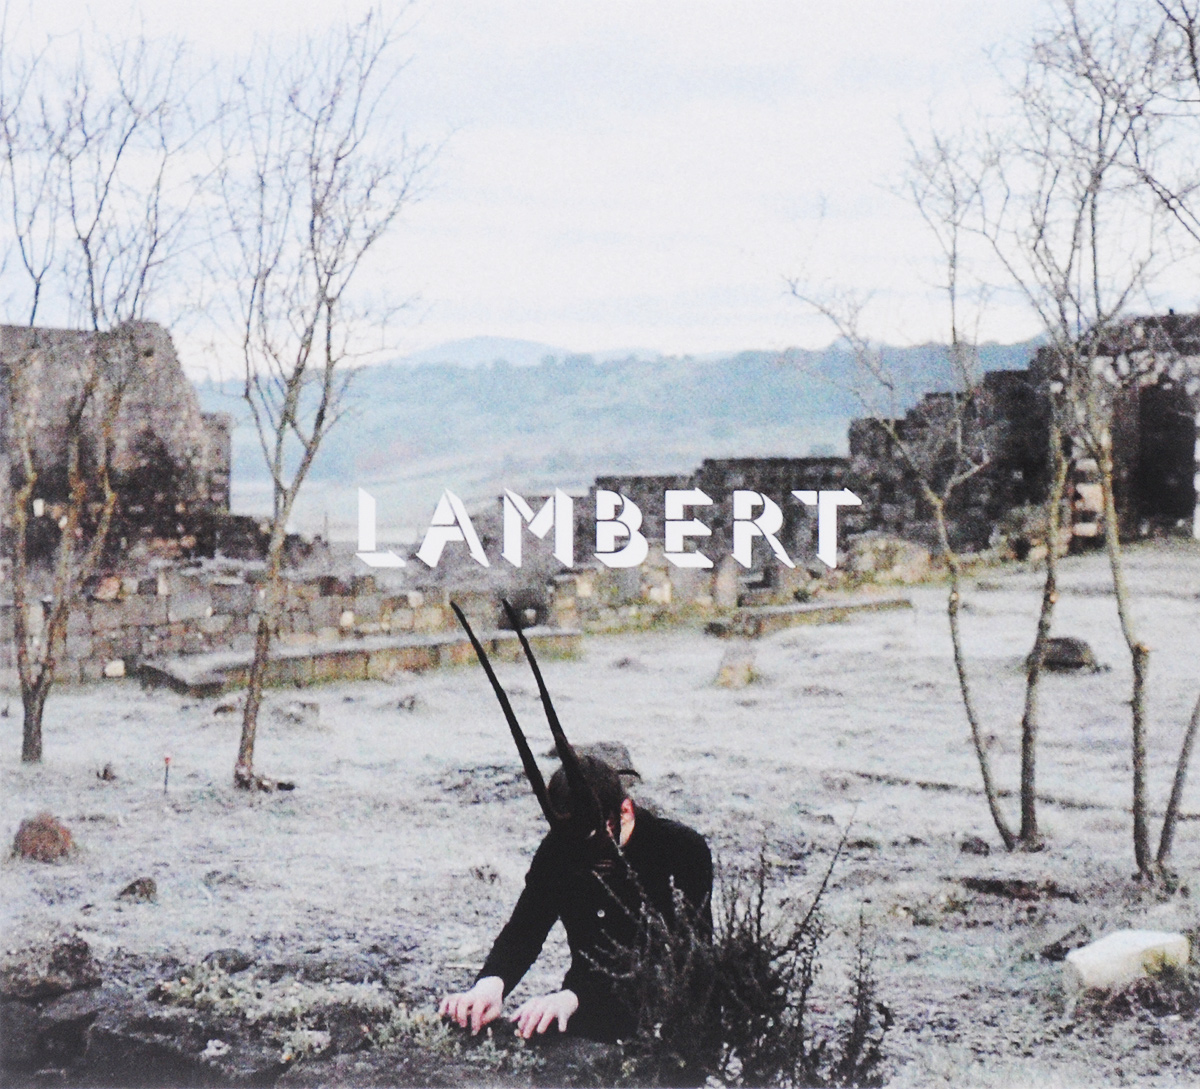 Lambert Lambert. Lambert monsieur lambert